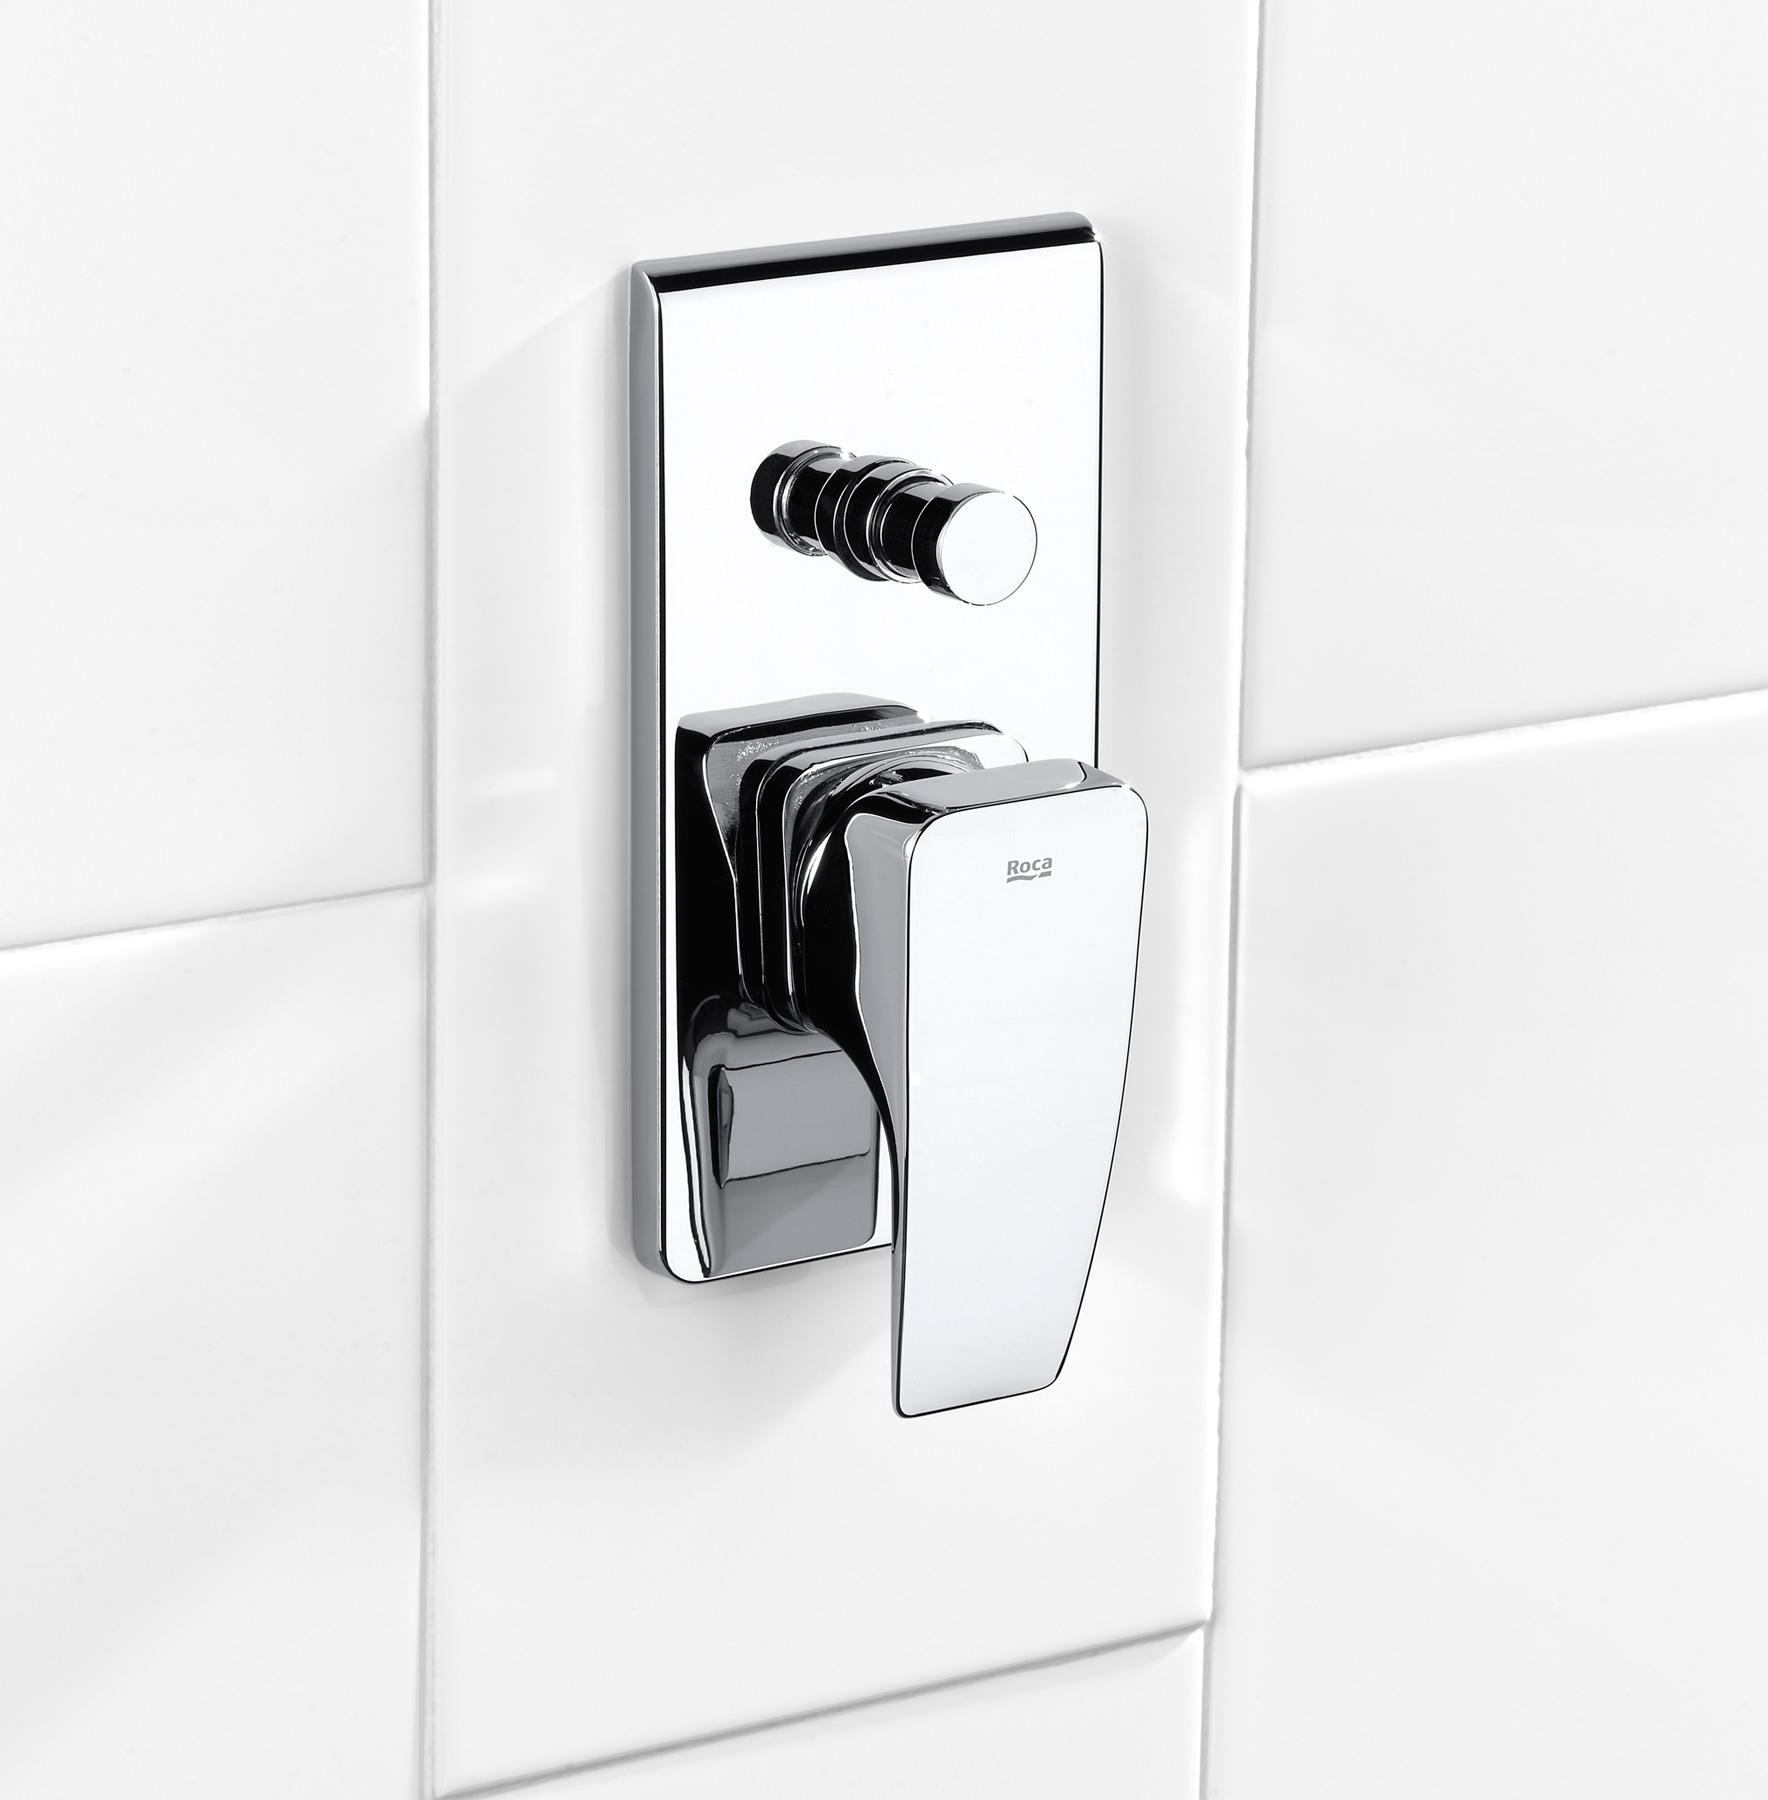 roca thesis chrome bath shower mixer valve with diverter roca thesis built in bath shower mixer valve